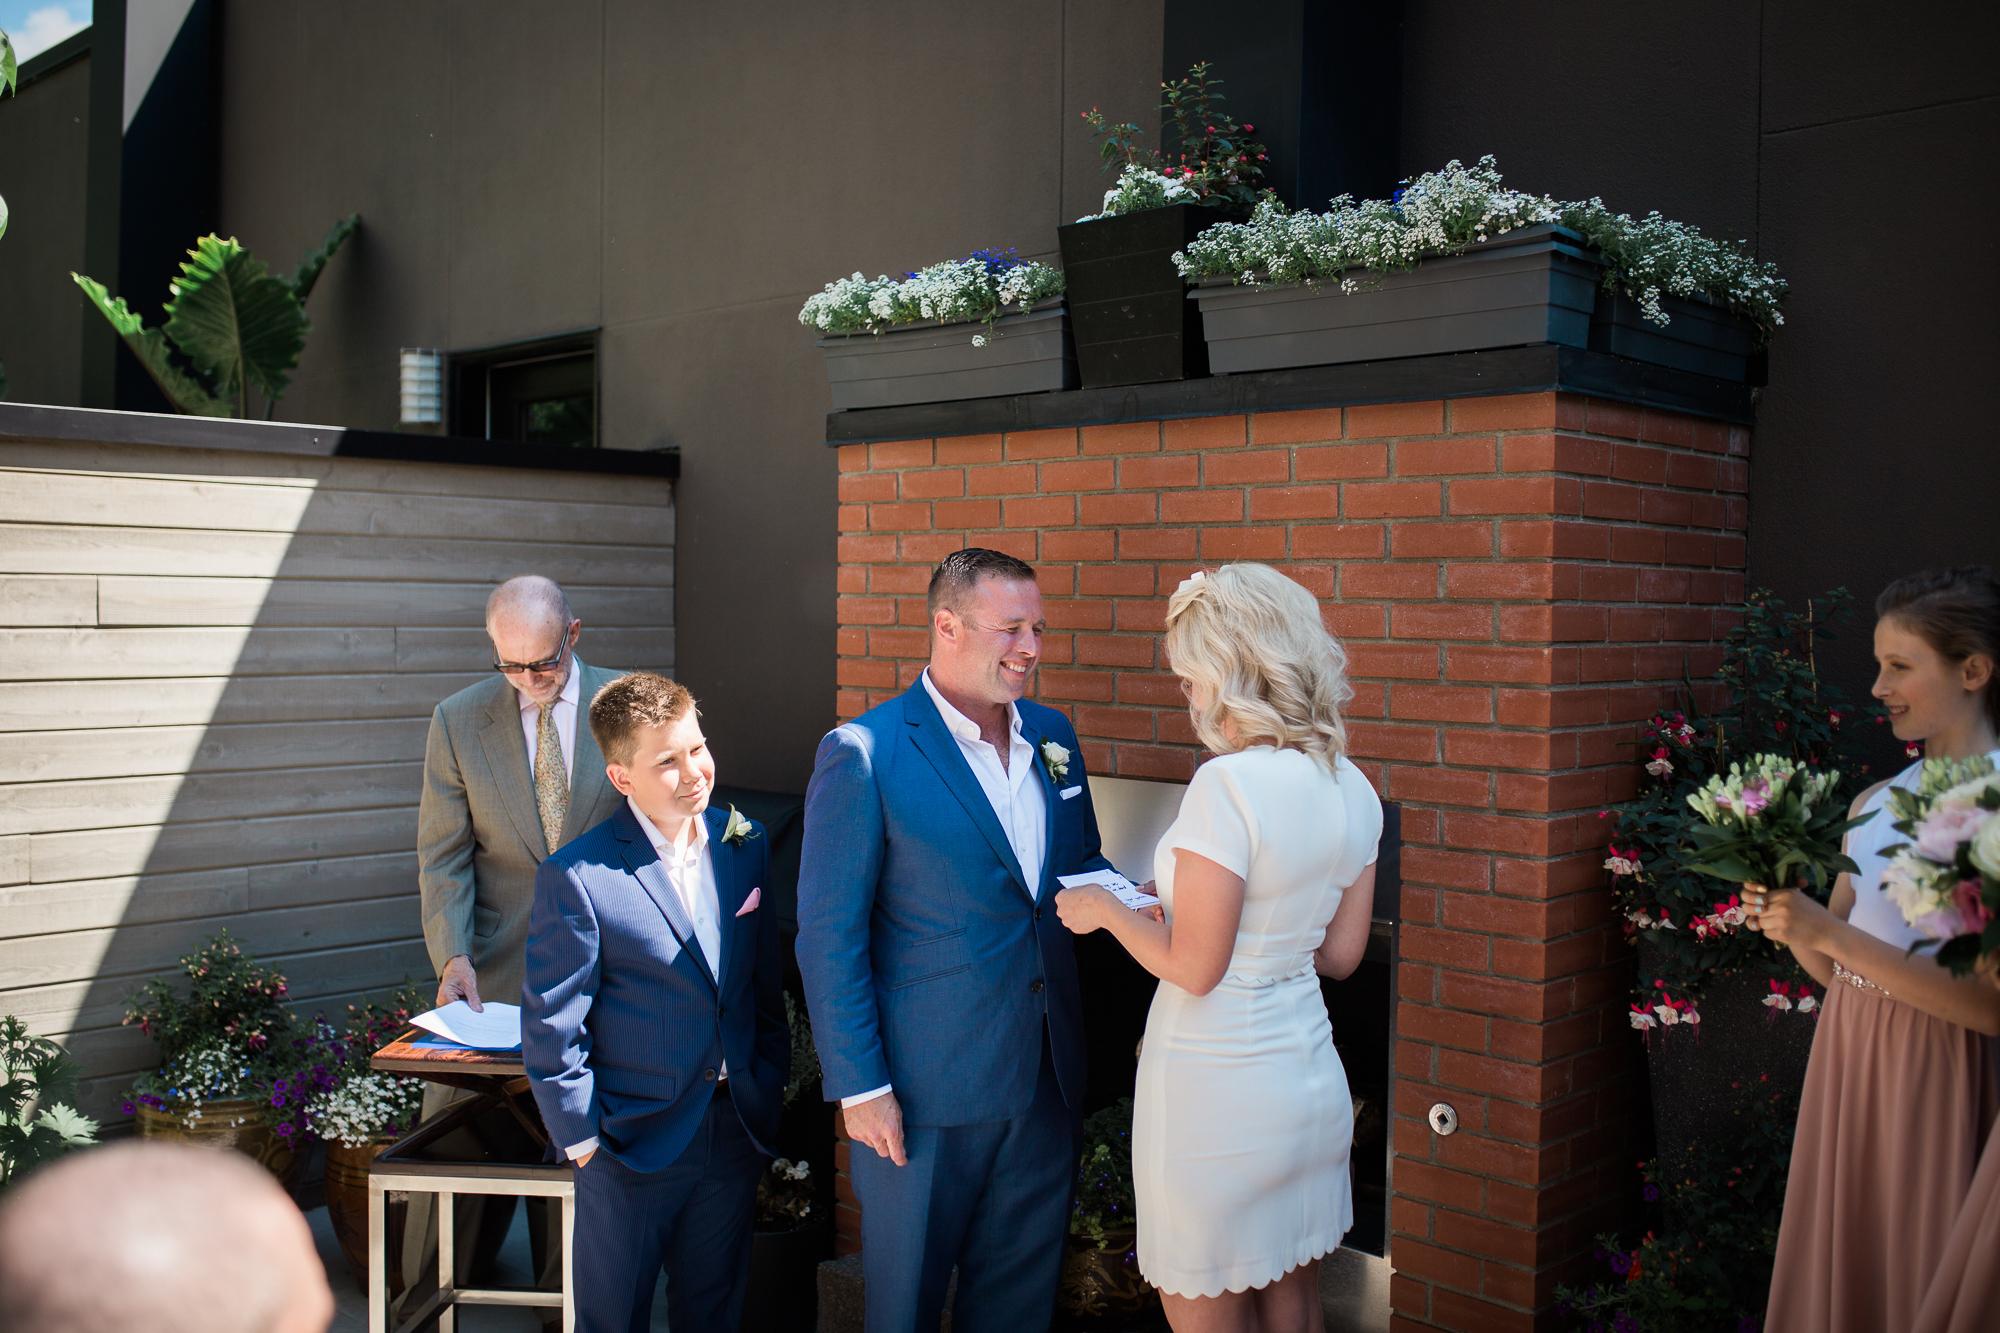 Calgary-wedding-photographer-CG-28.jpg